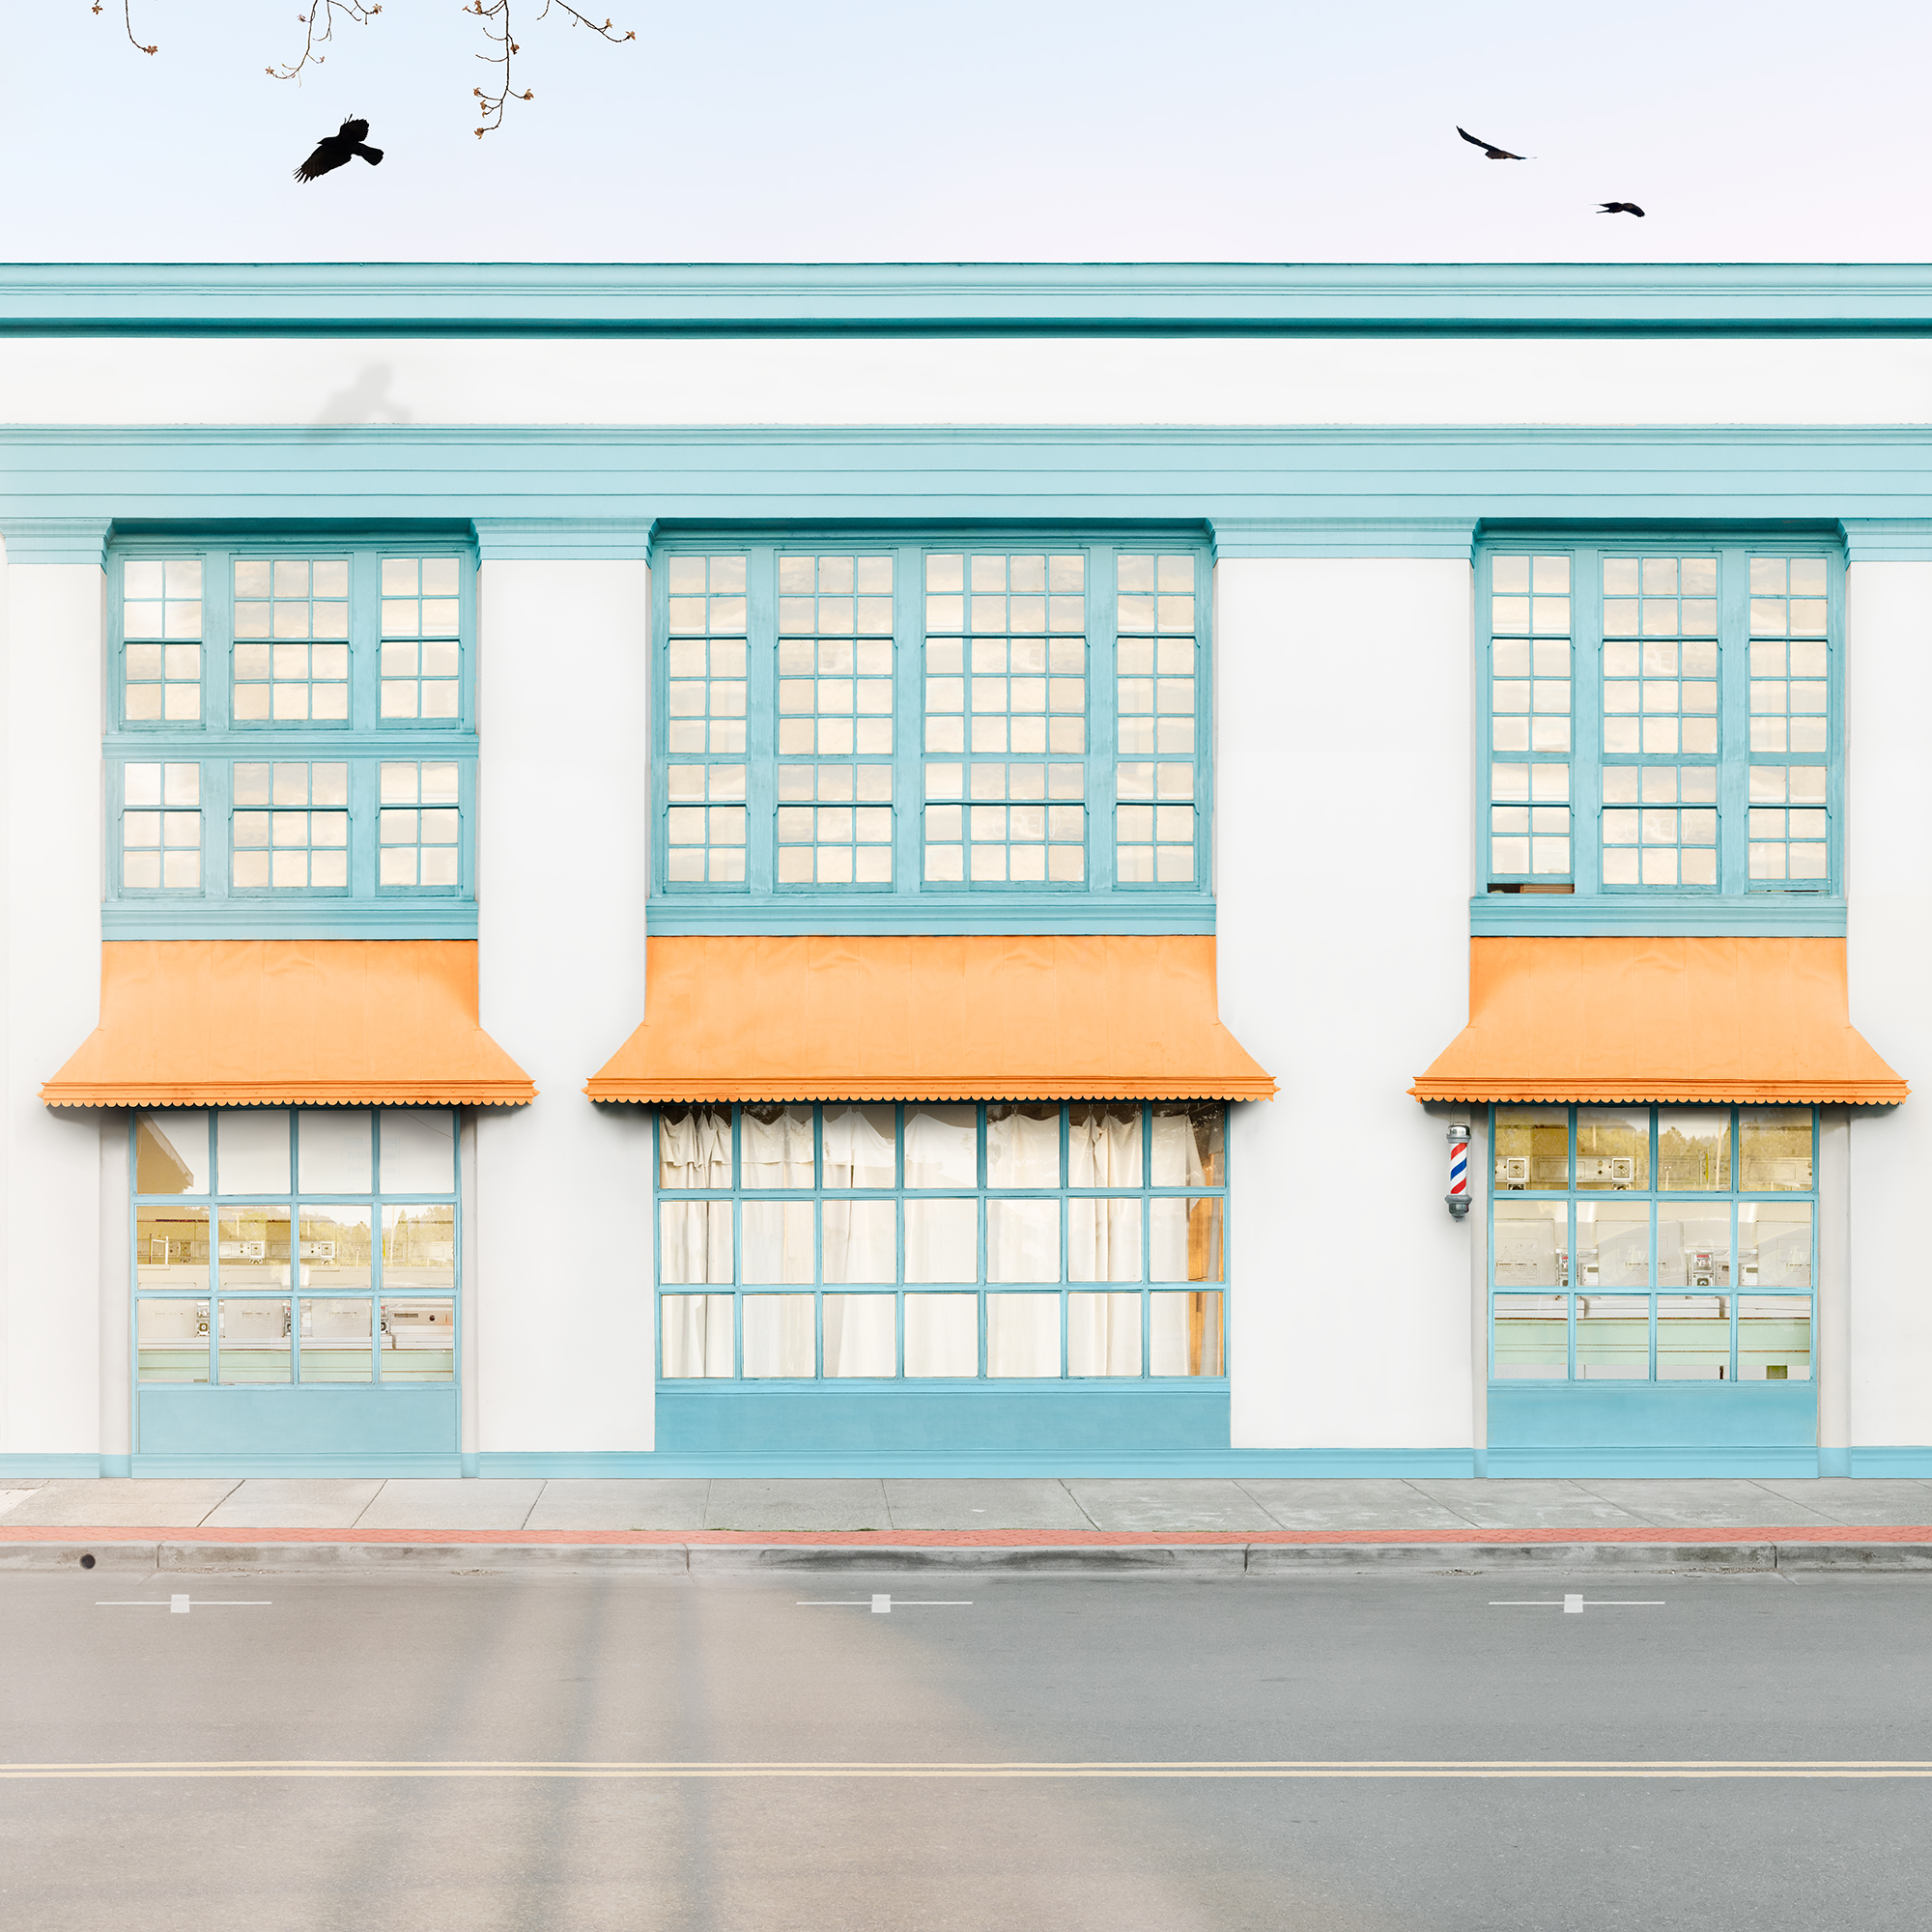 Laundromat , 43 x 43 inches, archival pigment print, Harmon Guest House, 2018